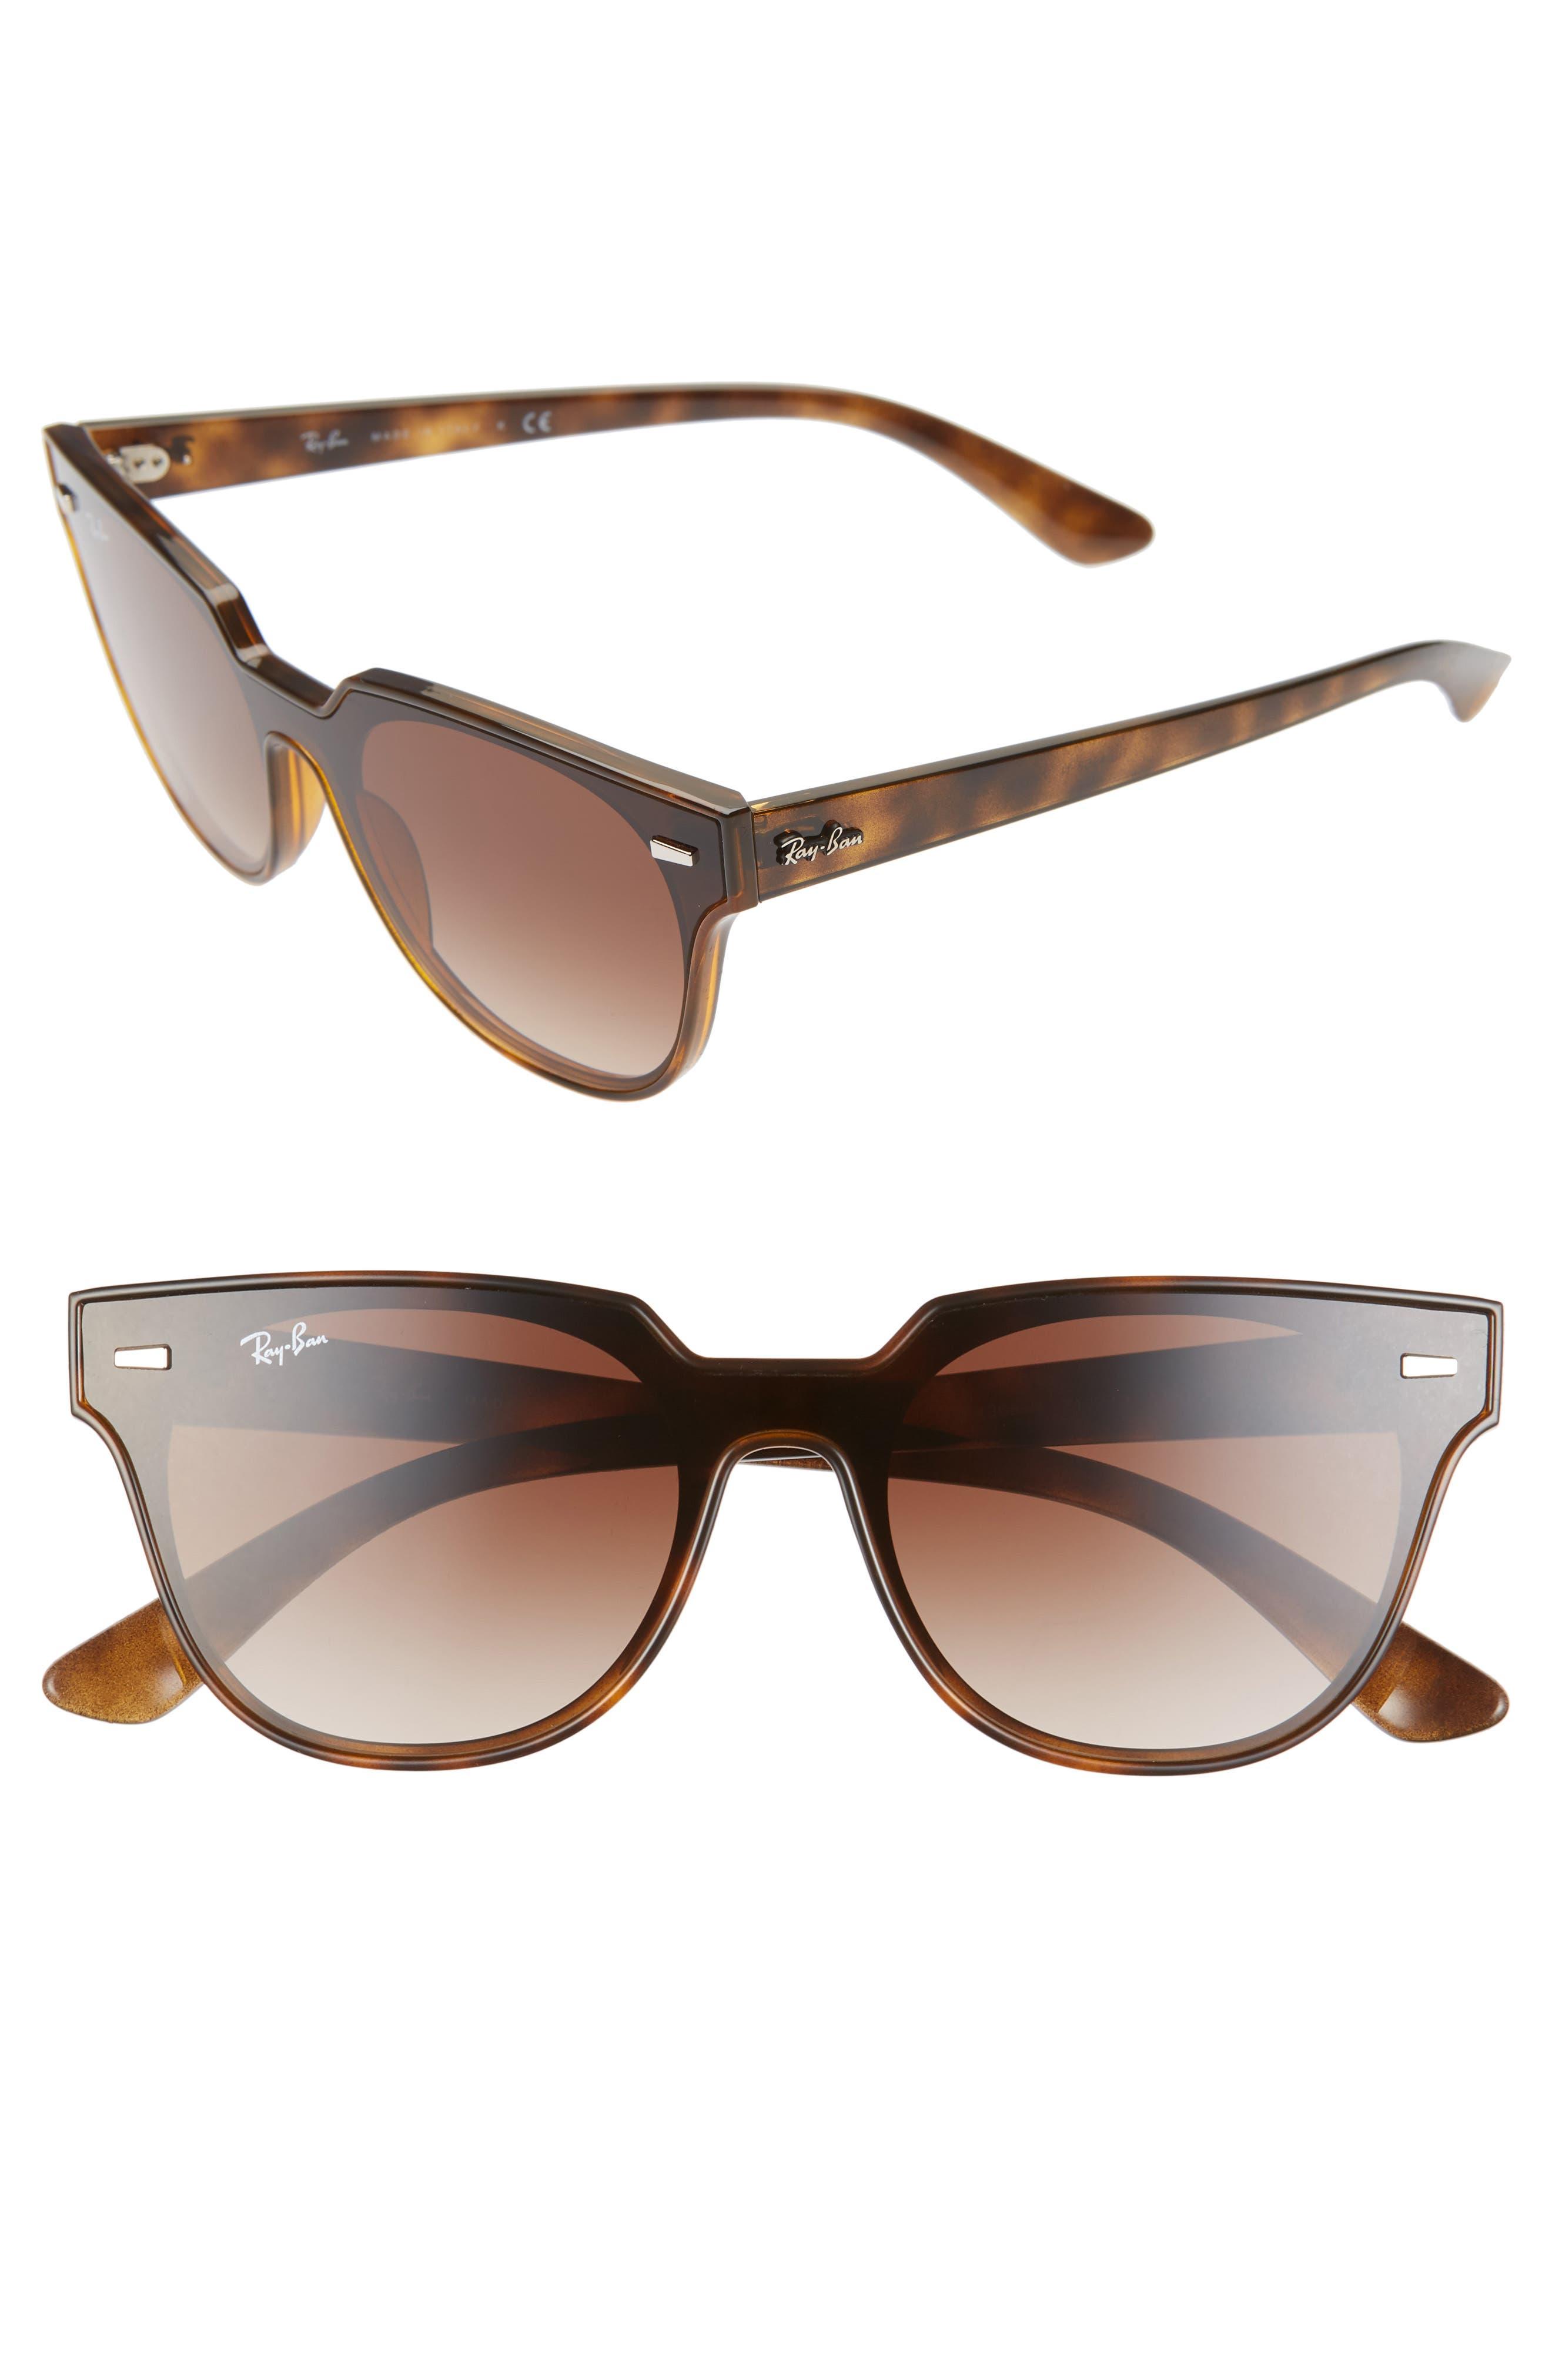 Ray-Ban Wayfarer 51Mm Sunglasses - Havana